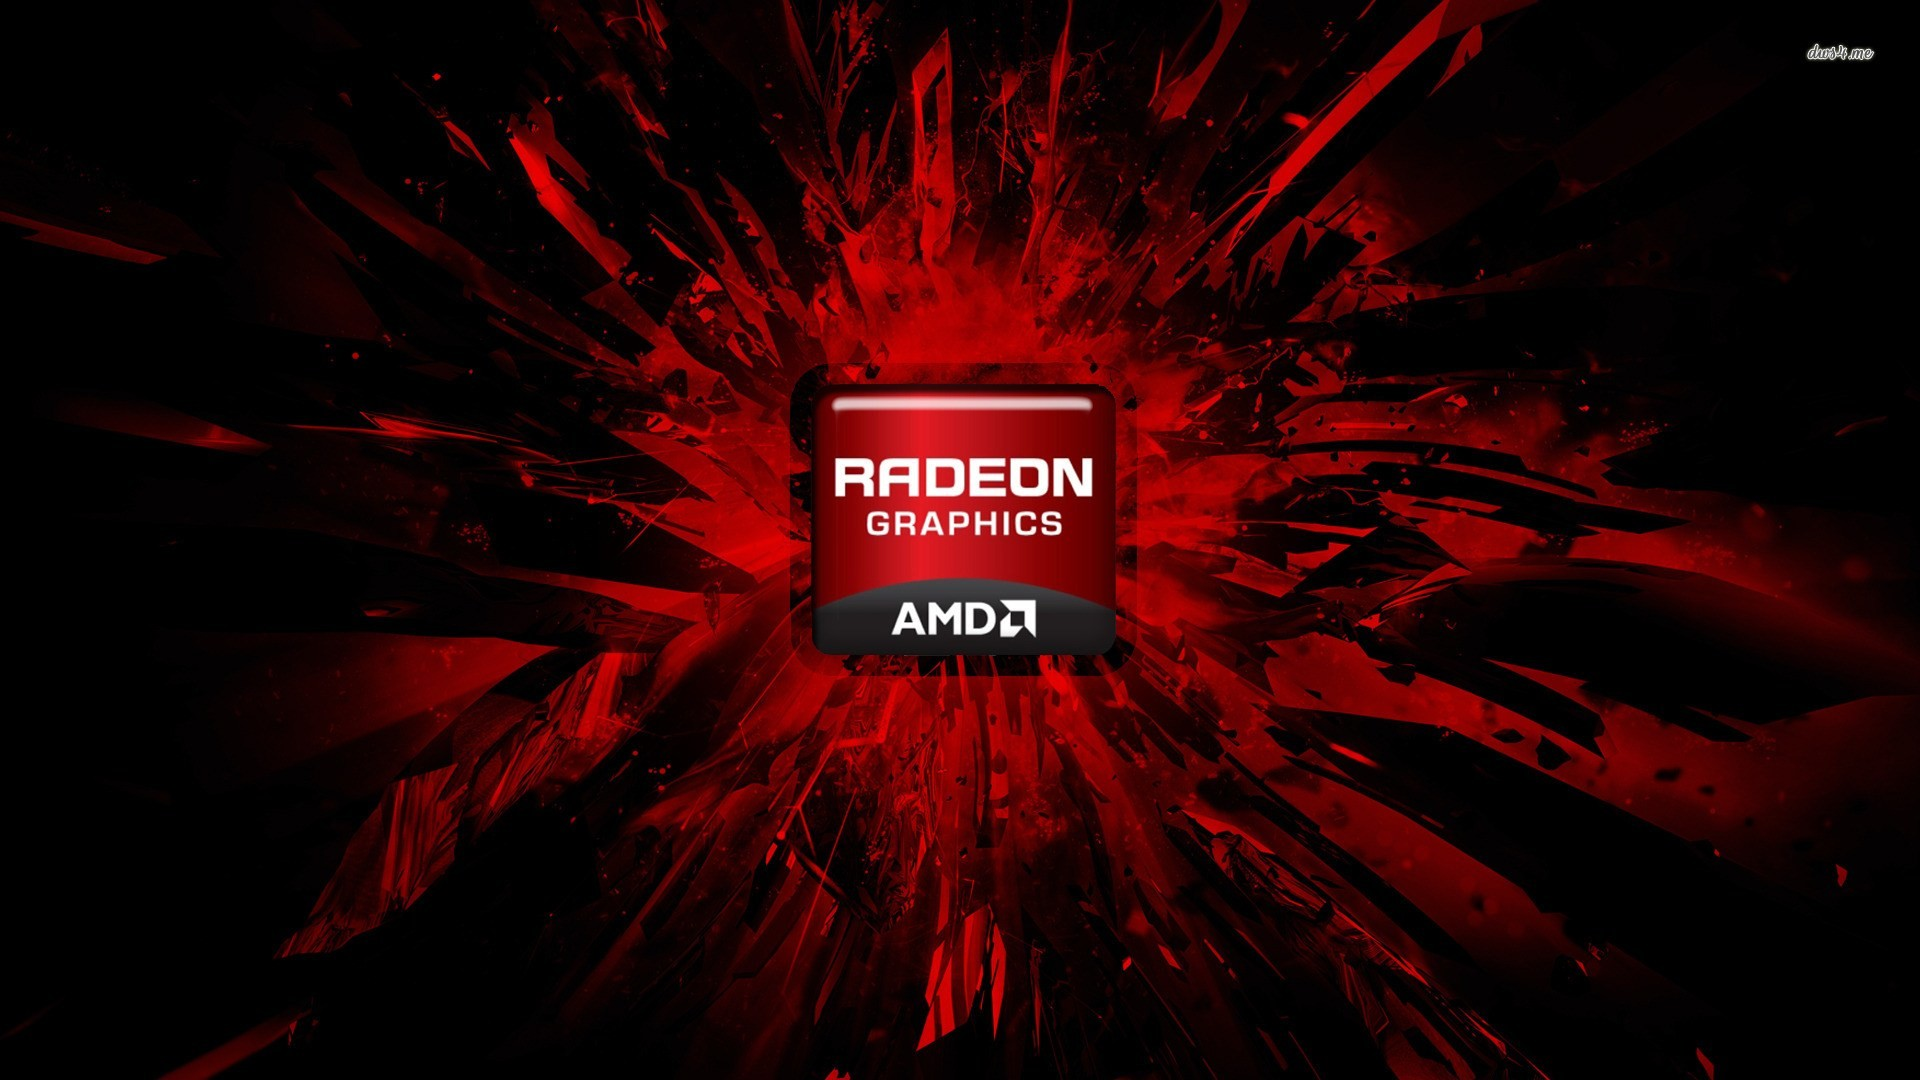 Dual Slot Card, Full Length Featuring 8 GB of HBM2 VRAM – AMD Vega 10 GPU  Based Radeon Vega Graphic Card Pictured